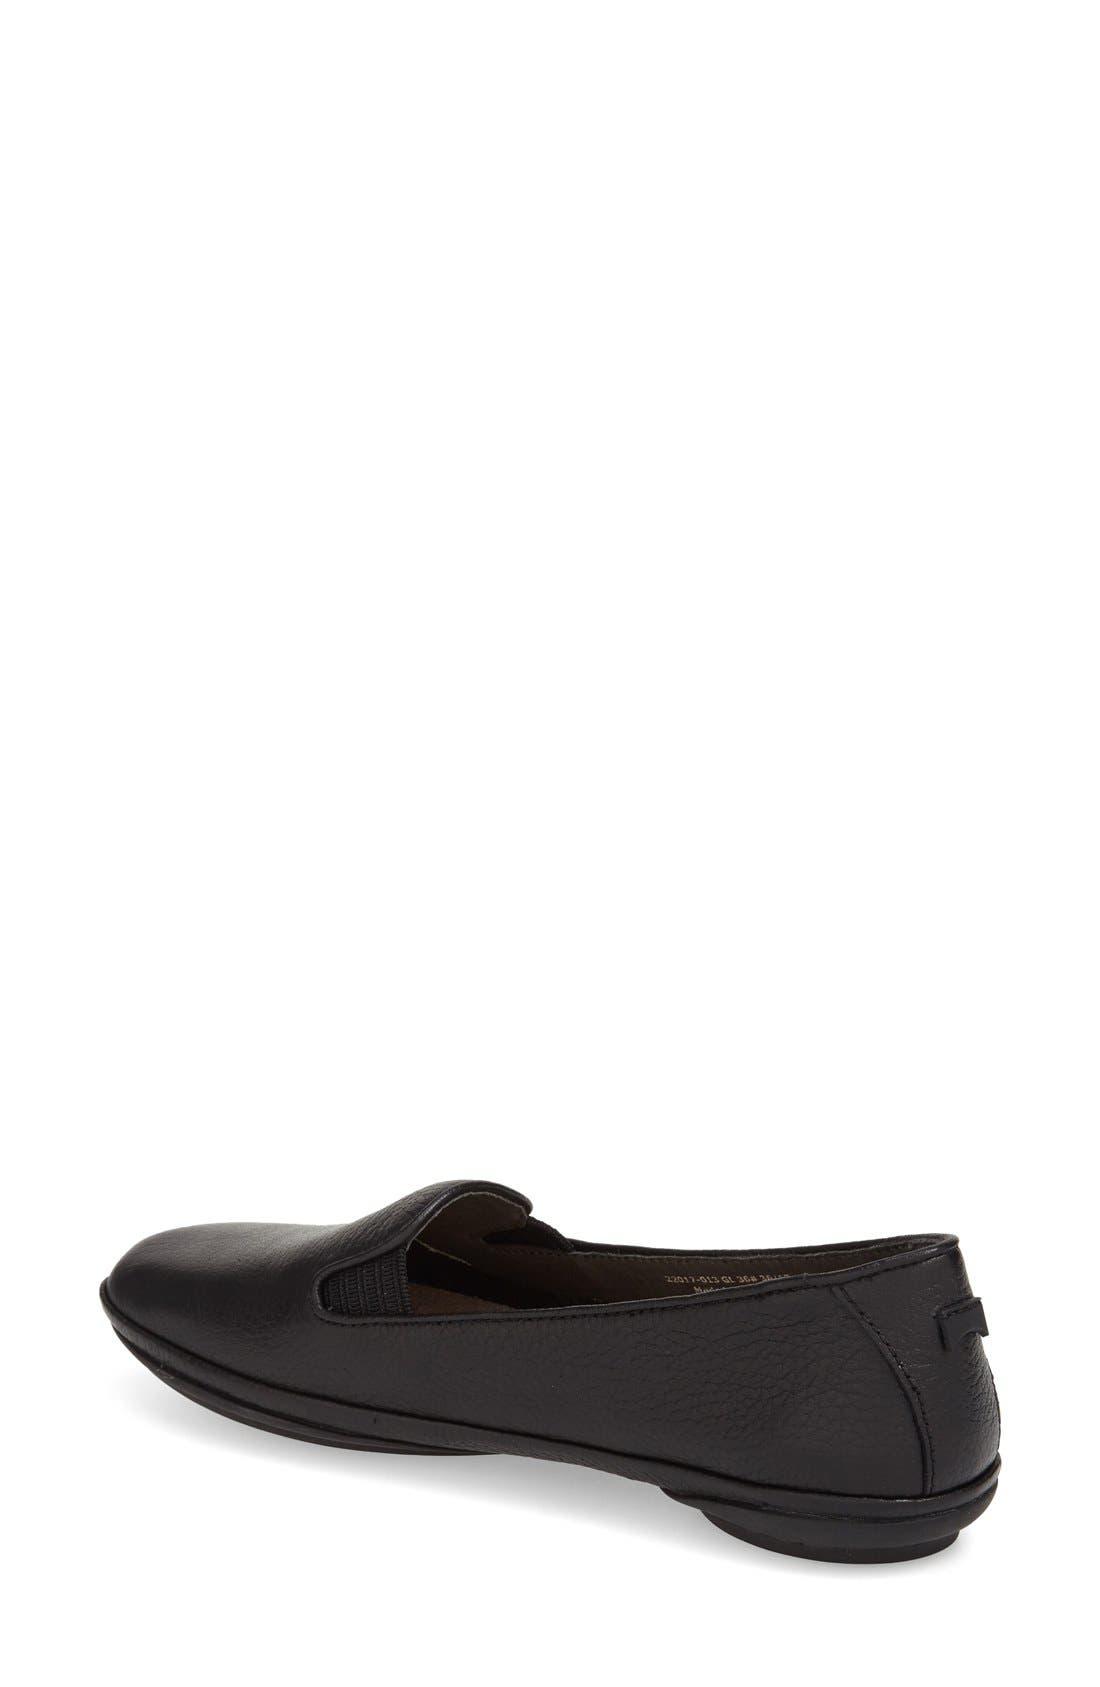 CAMPER, 'Right Nina' Leather Flat, Alternate thumbnail 2, color, BLACK/ BLACK LEATHER